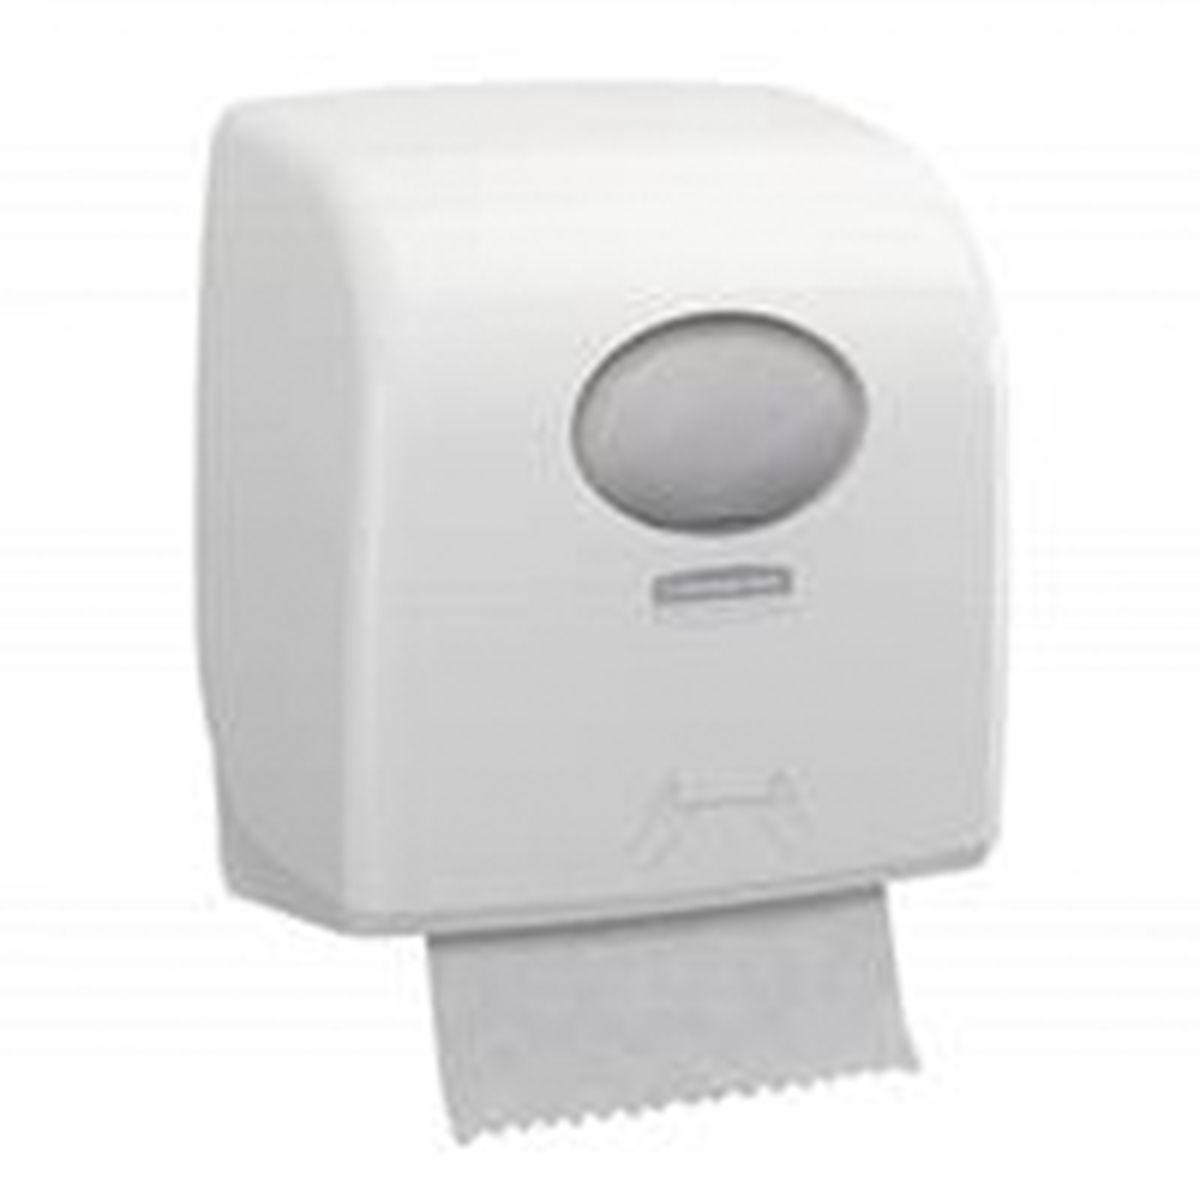 Diamond Plate Aluminum Paper Towel Holder Magnetic or Screw Mount